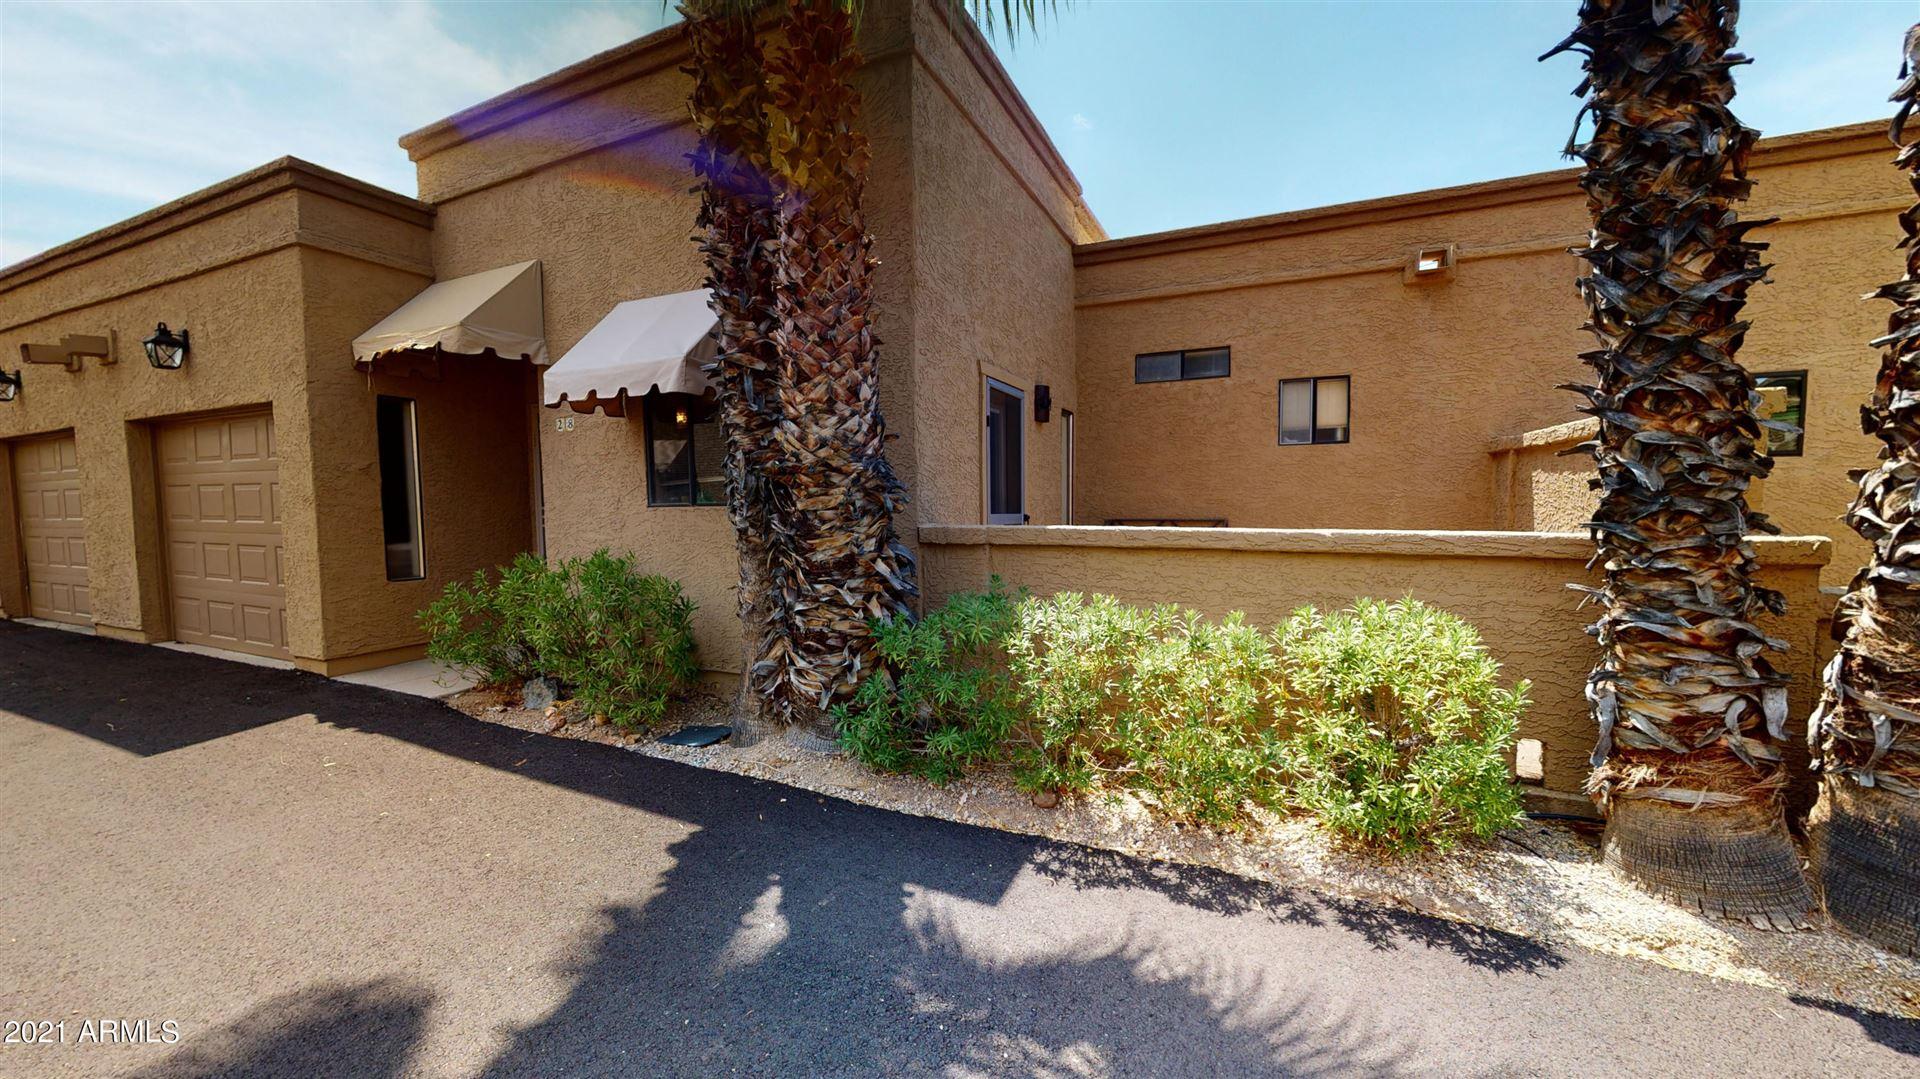 Photo of 7432 E CAREFREE Drive #28, Carefree, AZ 85377 (MLS # 6272411)